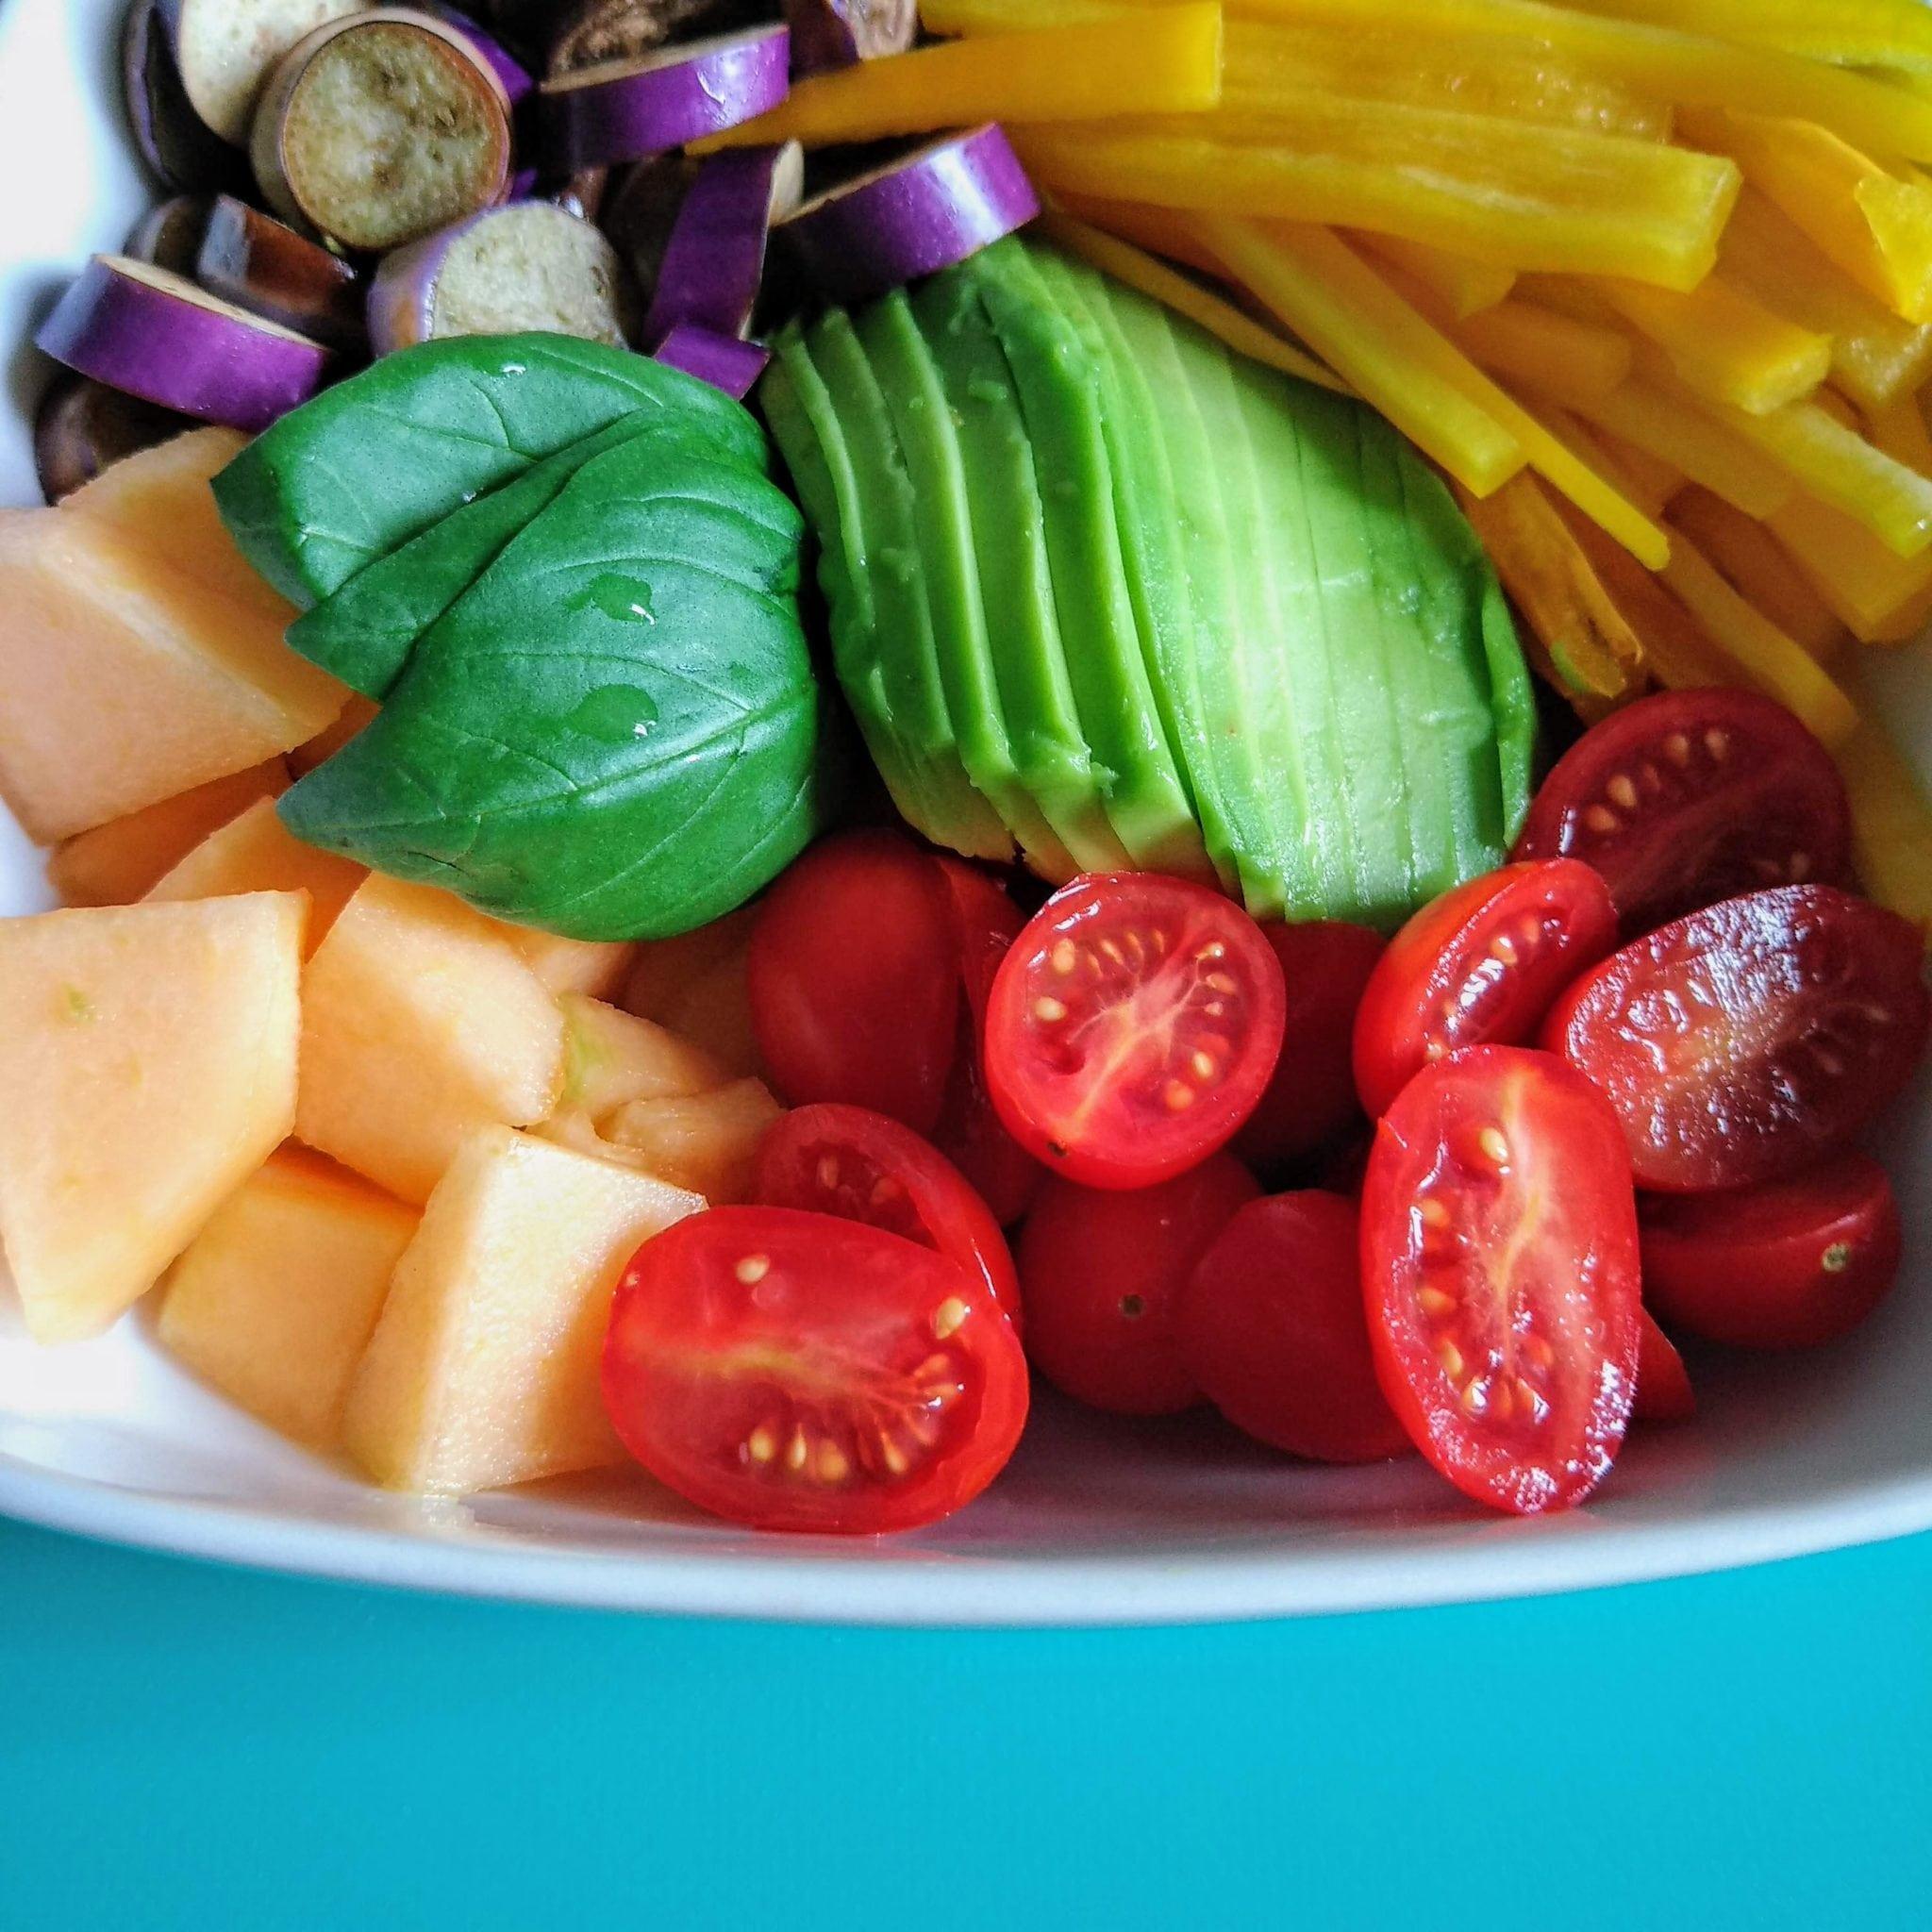 rainbow salad per widiba_spadelliamo 2